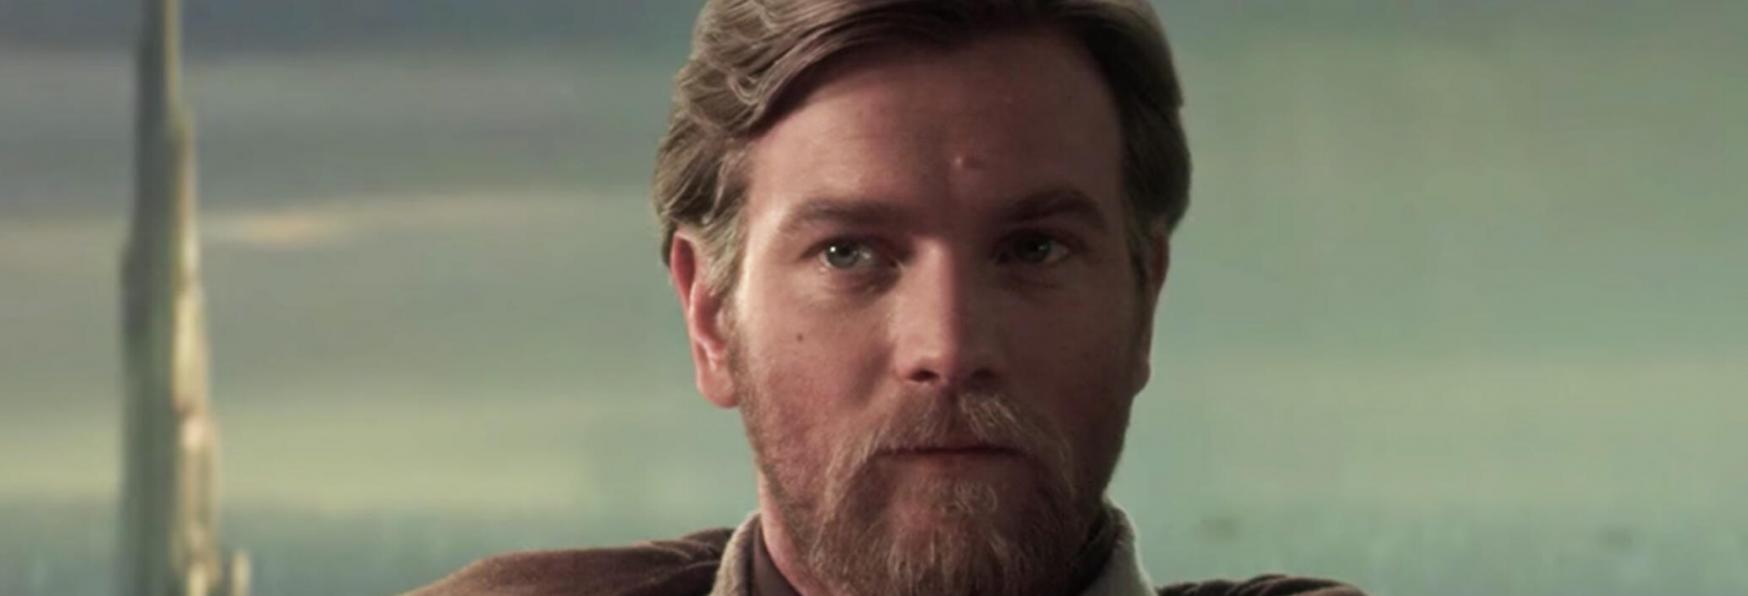 Star Wars: Kenobi - la star Ewan McGregor afferma che la Serie collegherà le prime due Trilogie